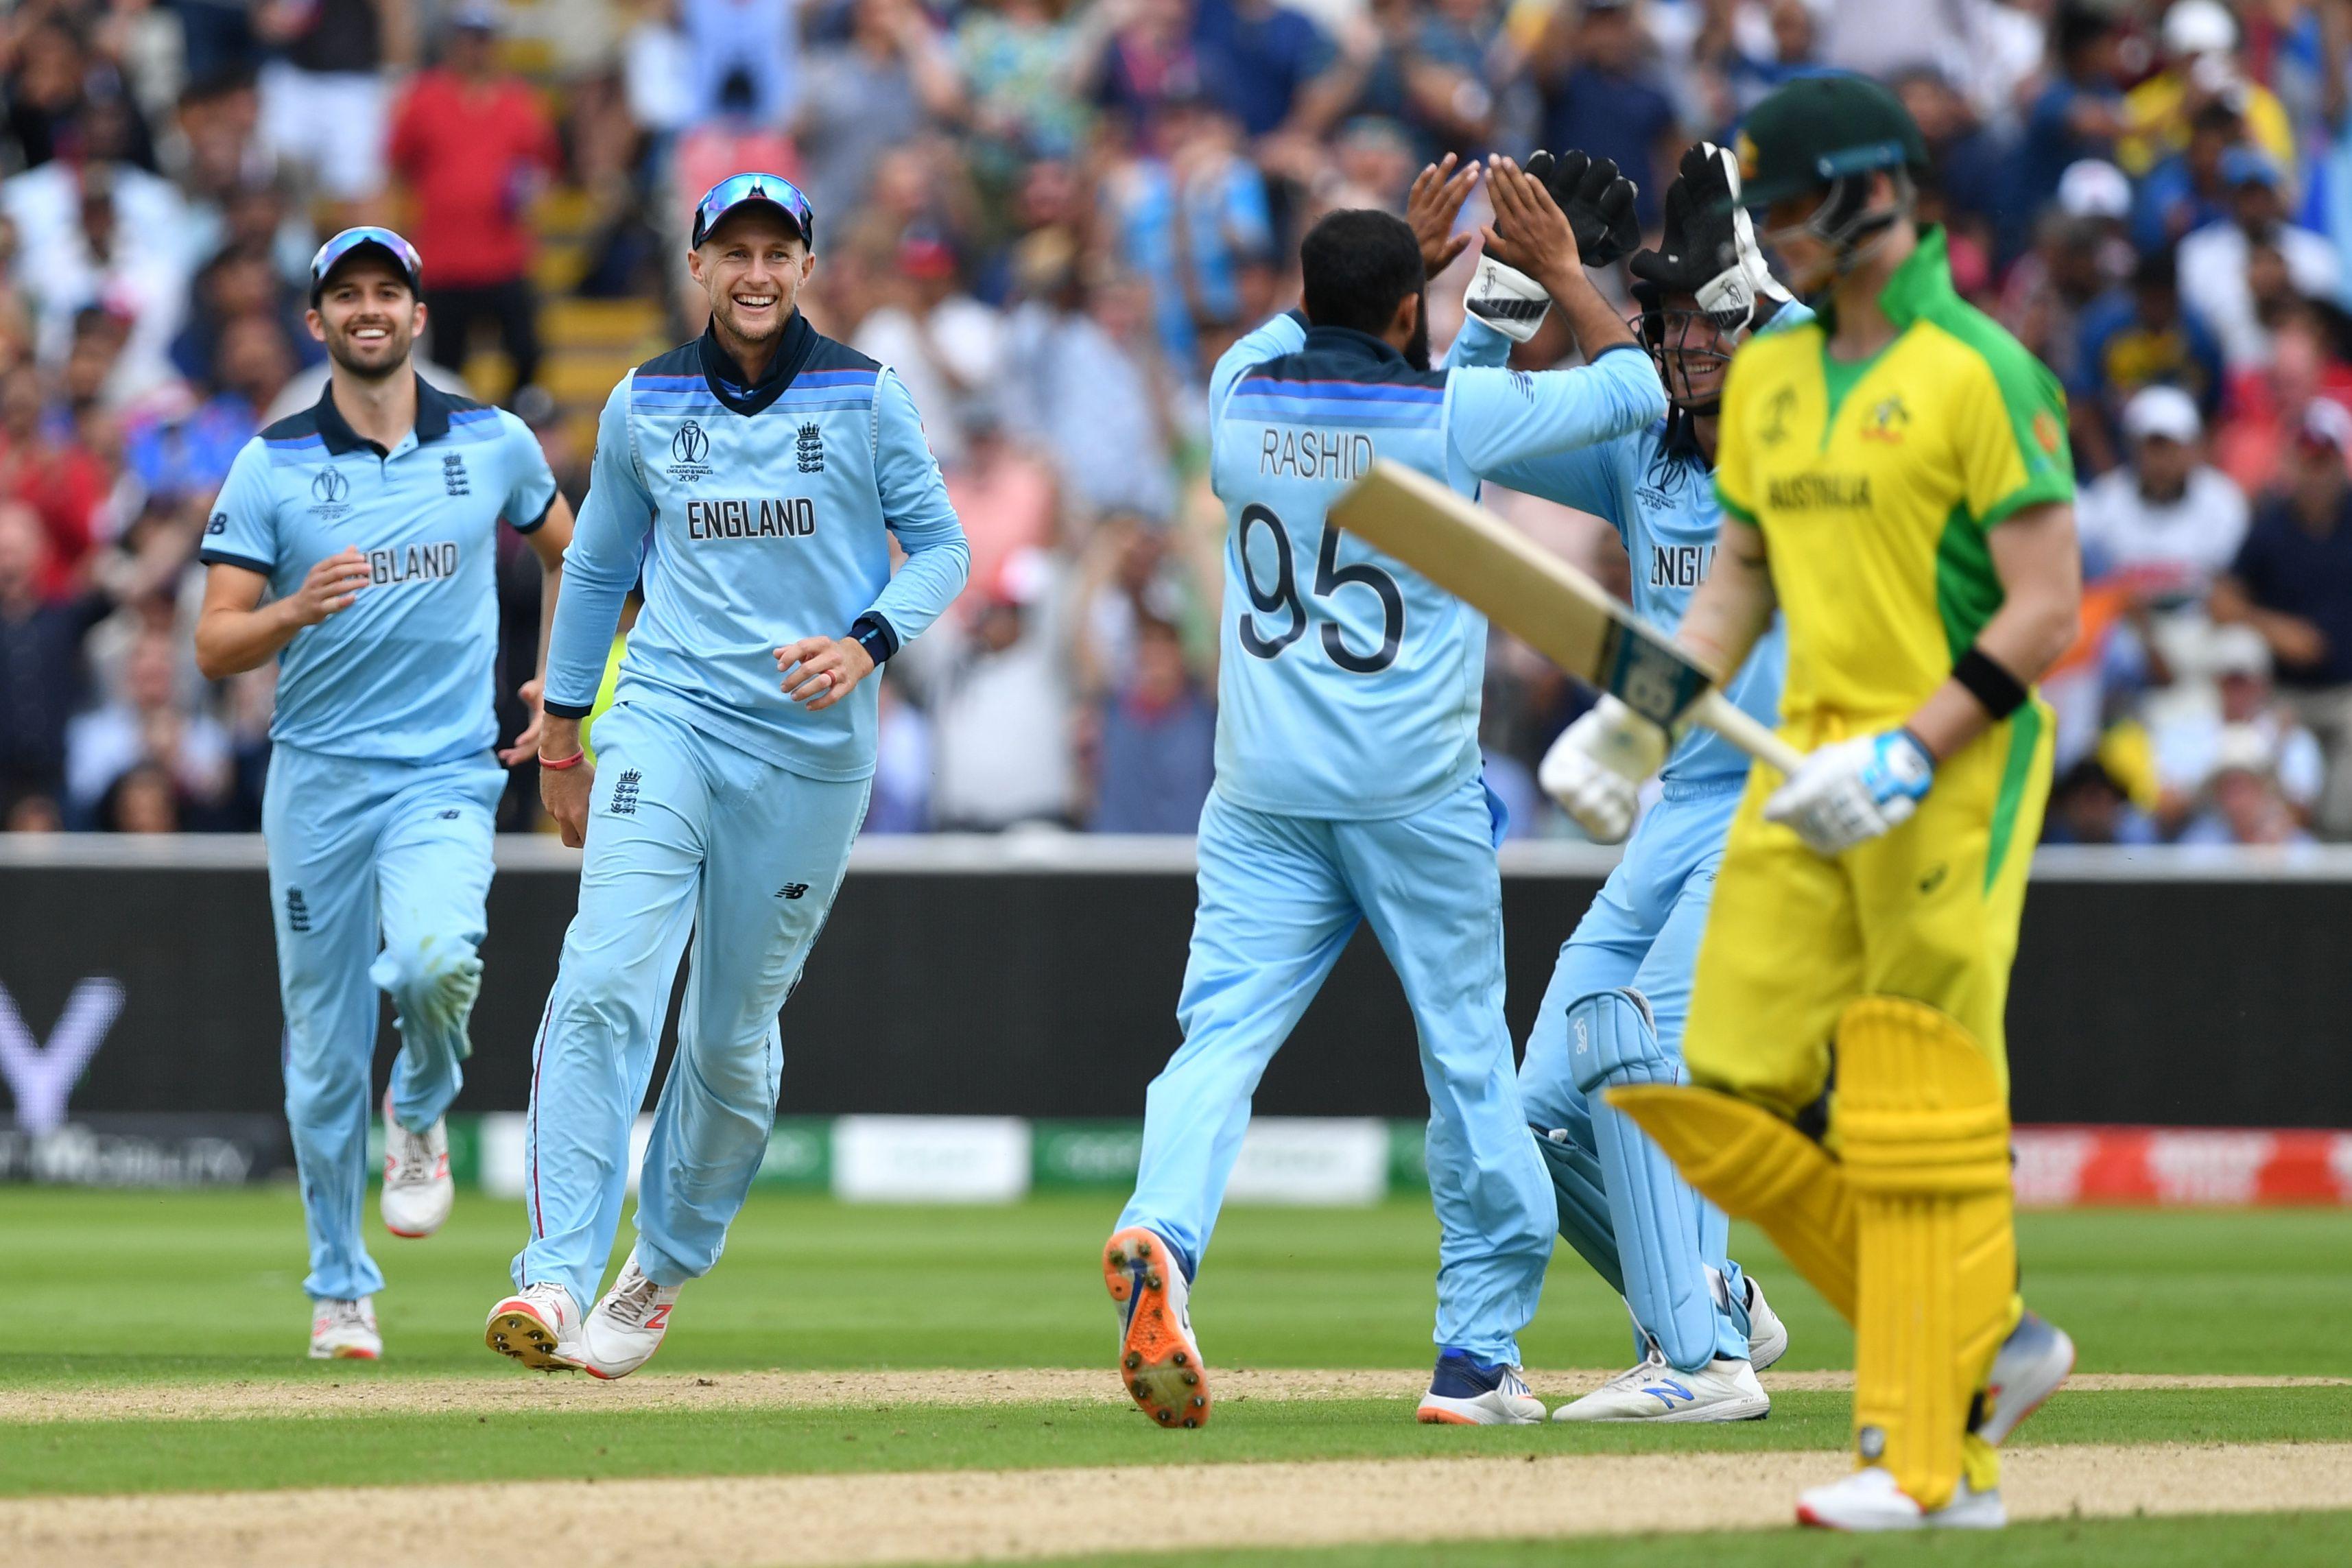 England´s Joe Root (2L) and England´s Adil Rashid (C) celebrate the wicket of Australia´s Pat Cummins (R). Photo: AFP